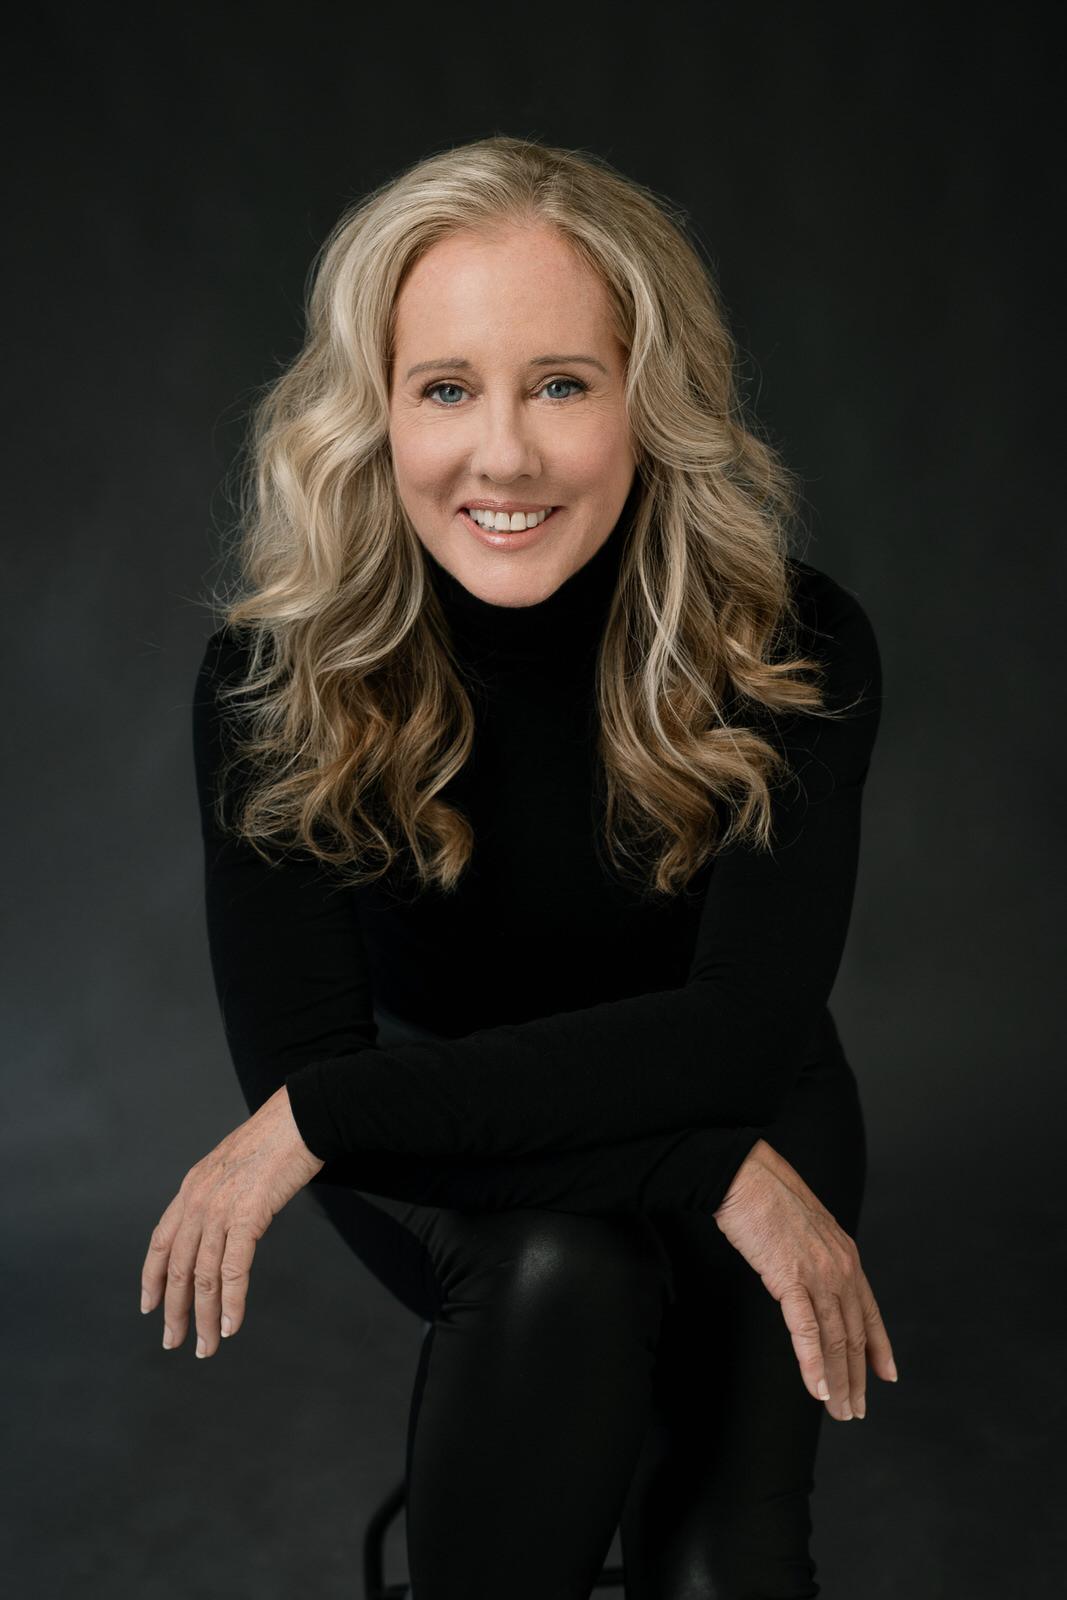 Photographer Jean Nestares wearing a black turtleneck and black pants against a black background